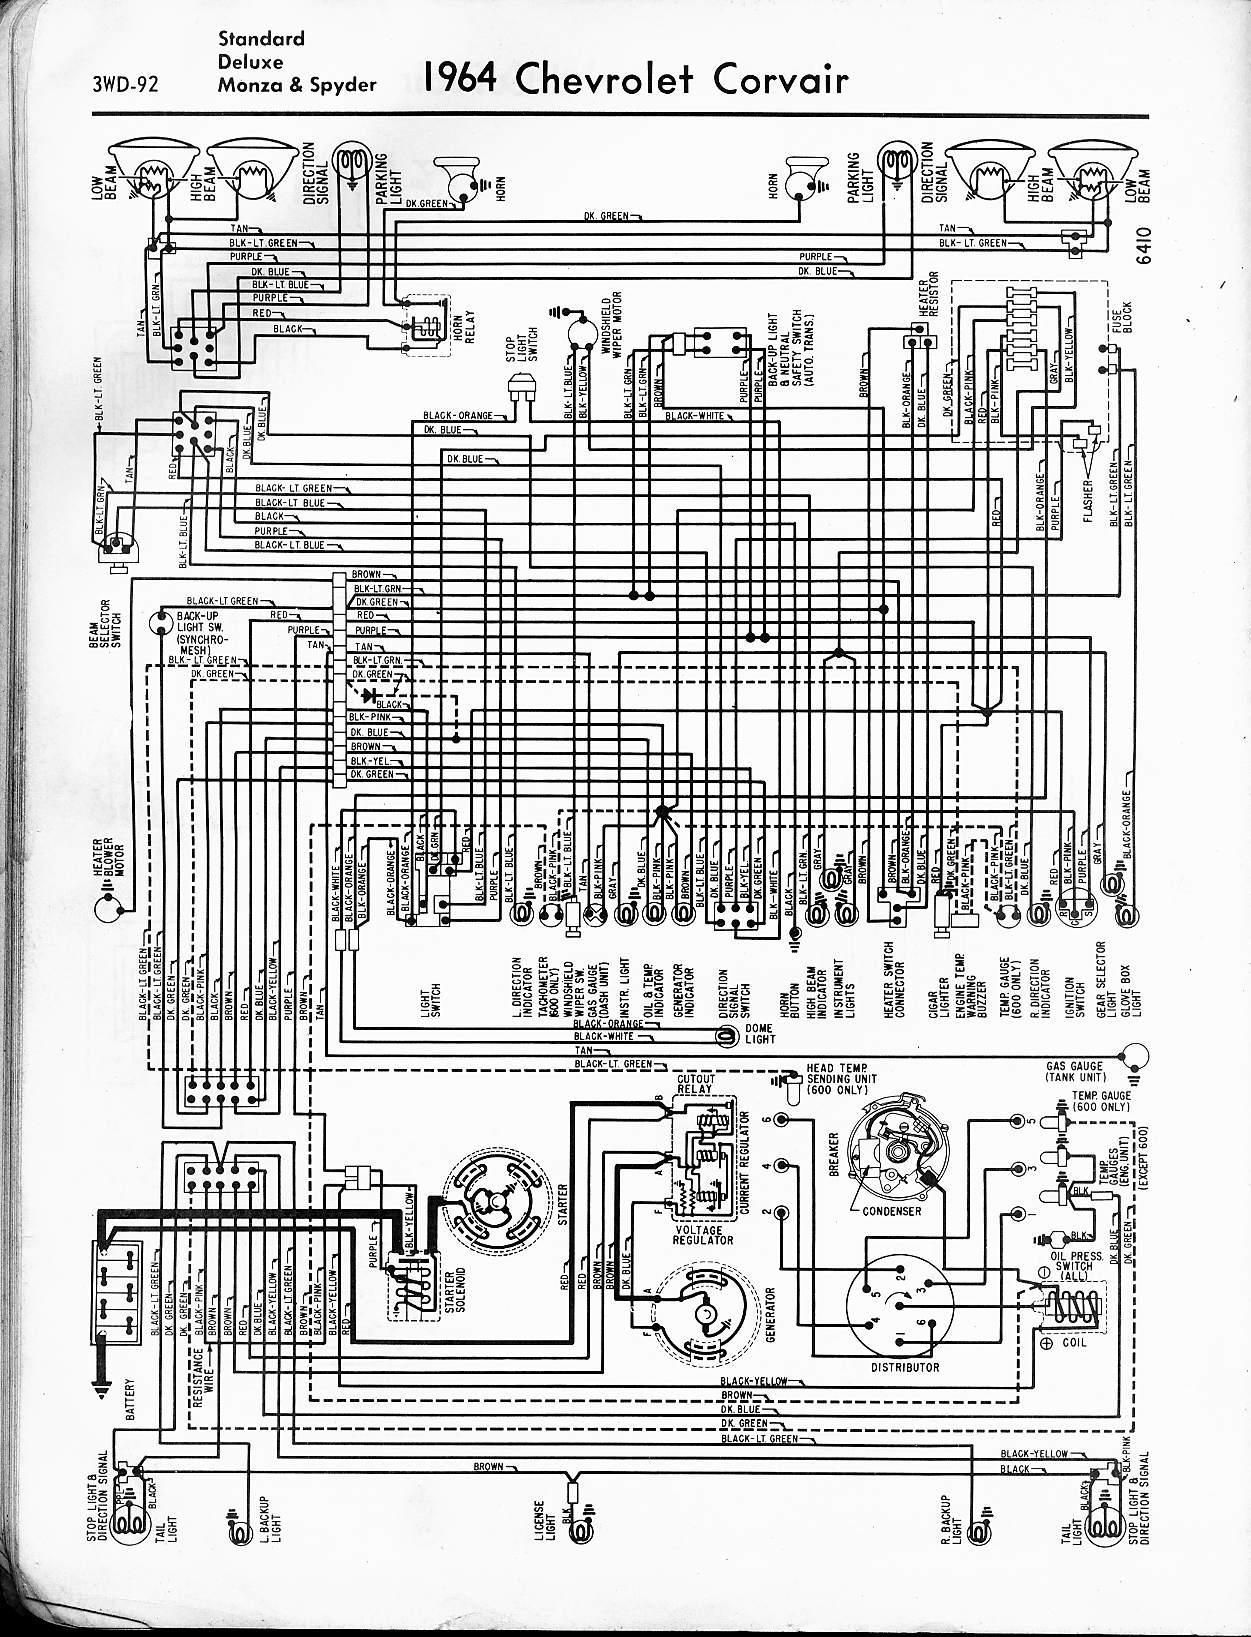 car diagrams 1961 cadillac wiring diagram 1967 plymouth